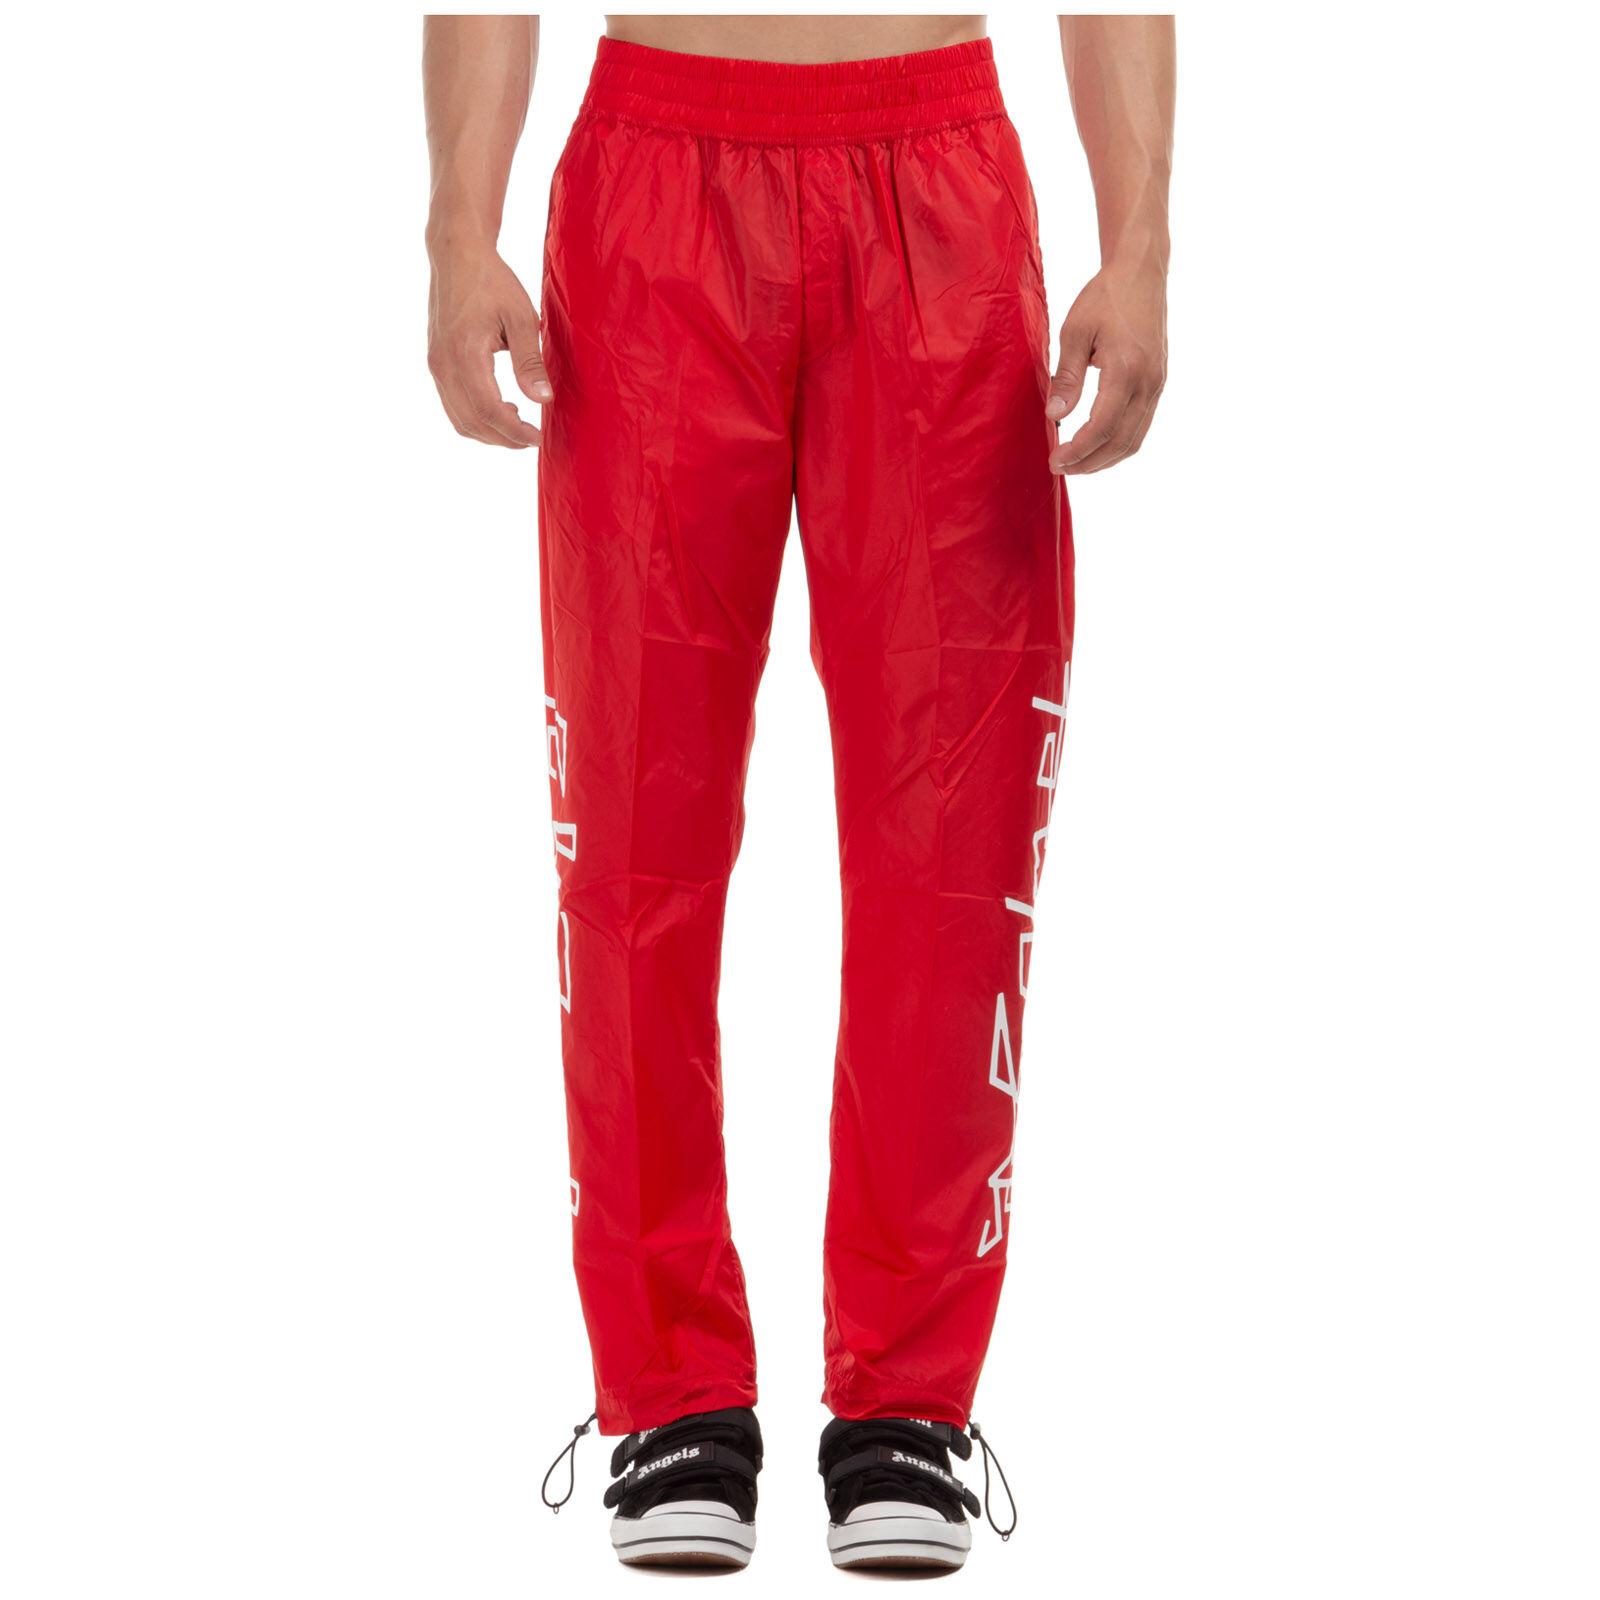 Palm Men's sport tracksuit trousers desert logo  - Red - Size: Medium